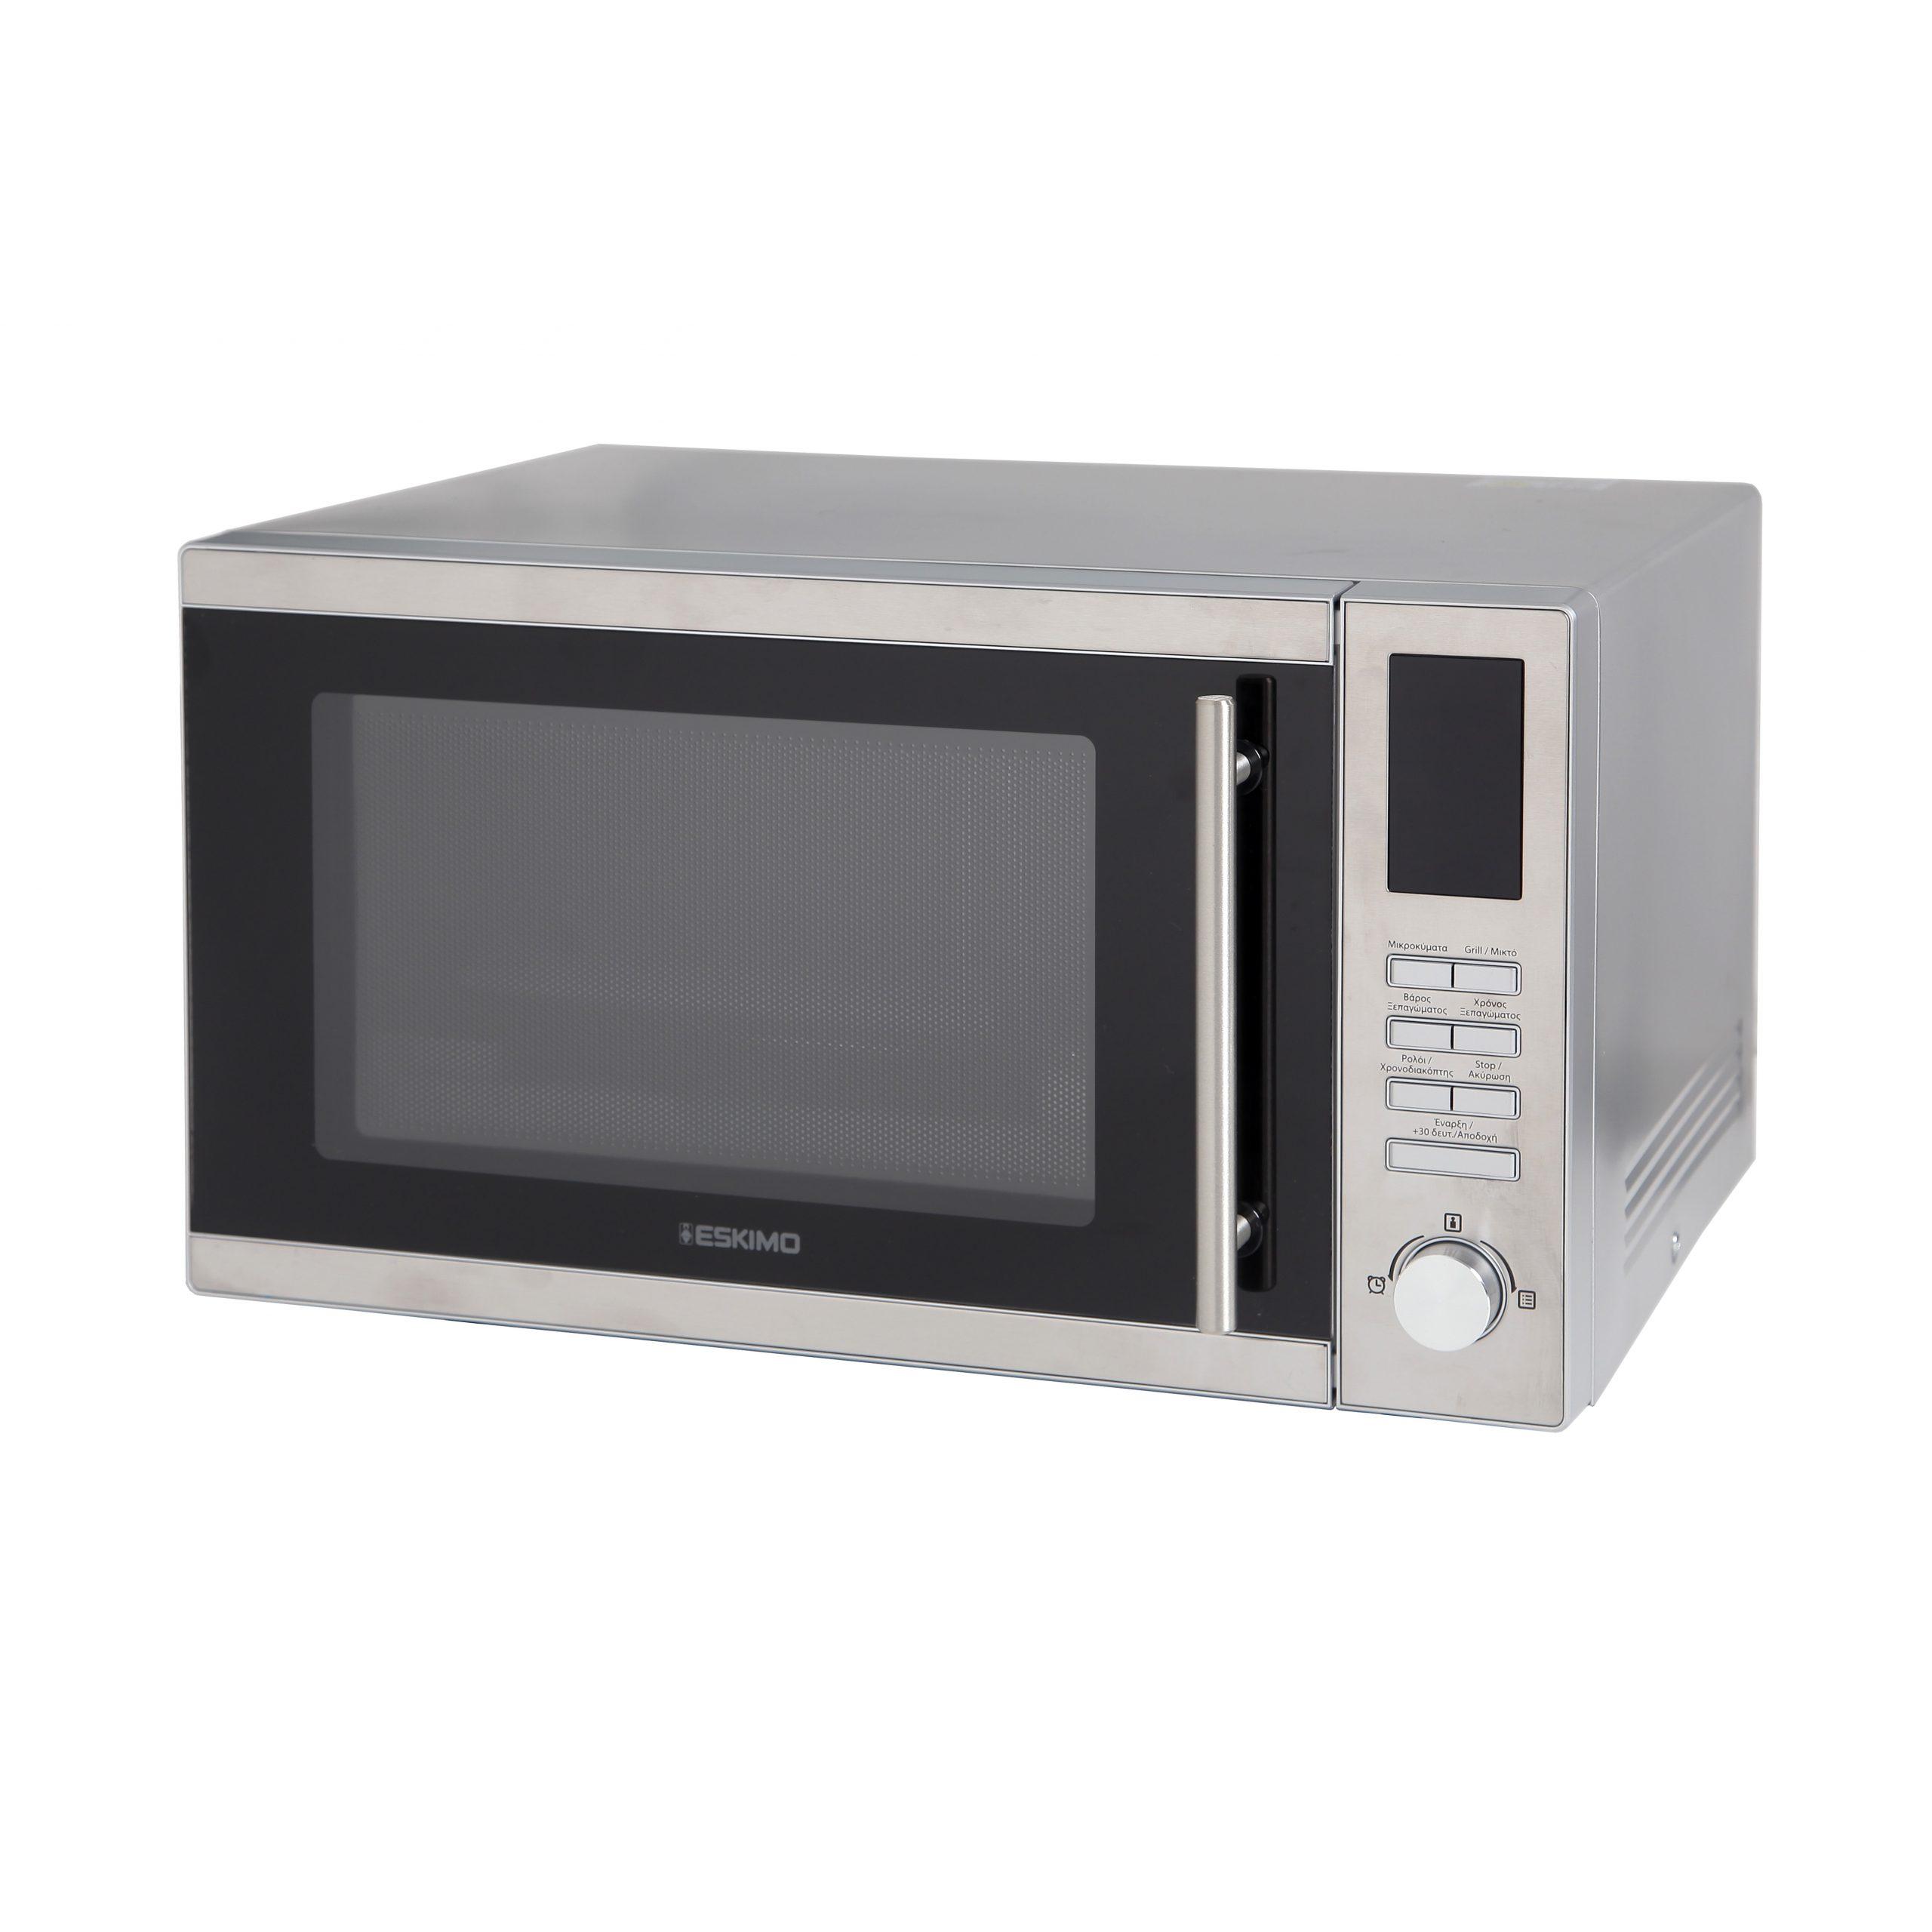 Eskimo Φούρνος Μικροκυμάτων ES 2509 ING